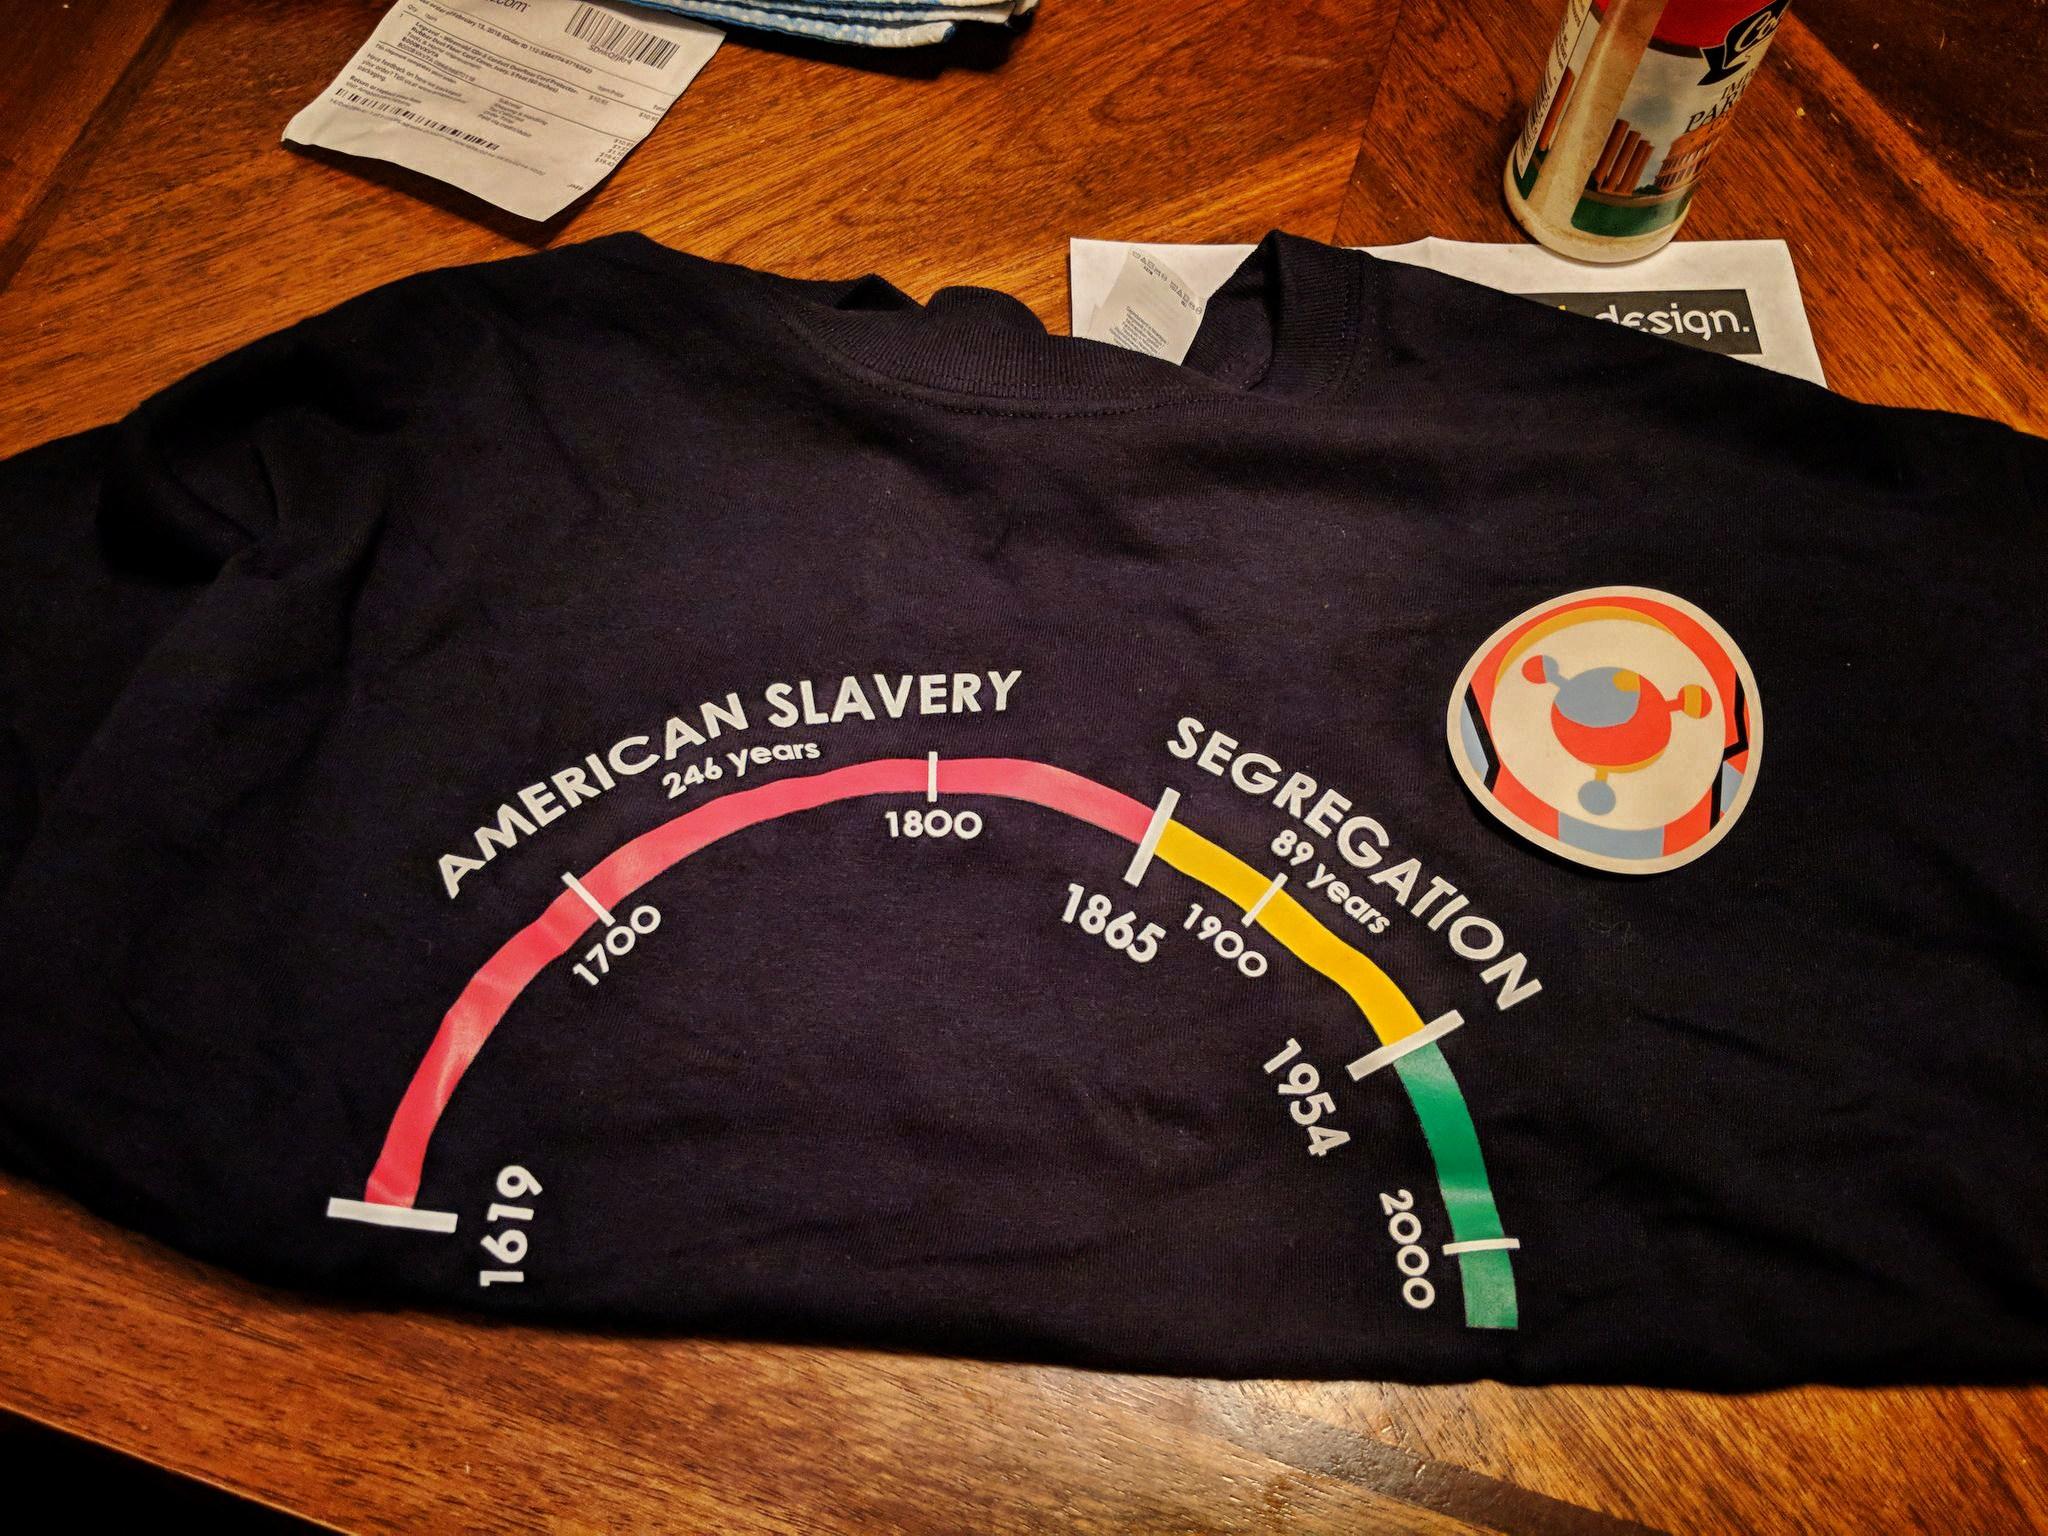 """But slavery was so long ago"""